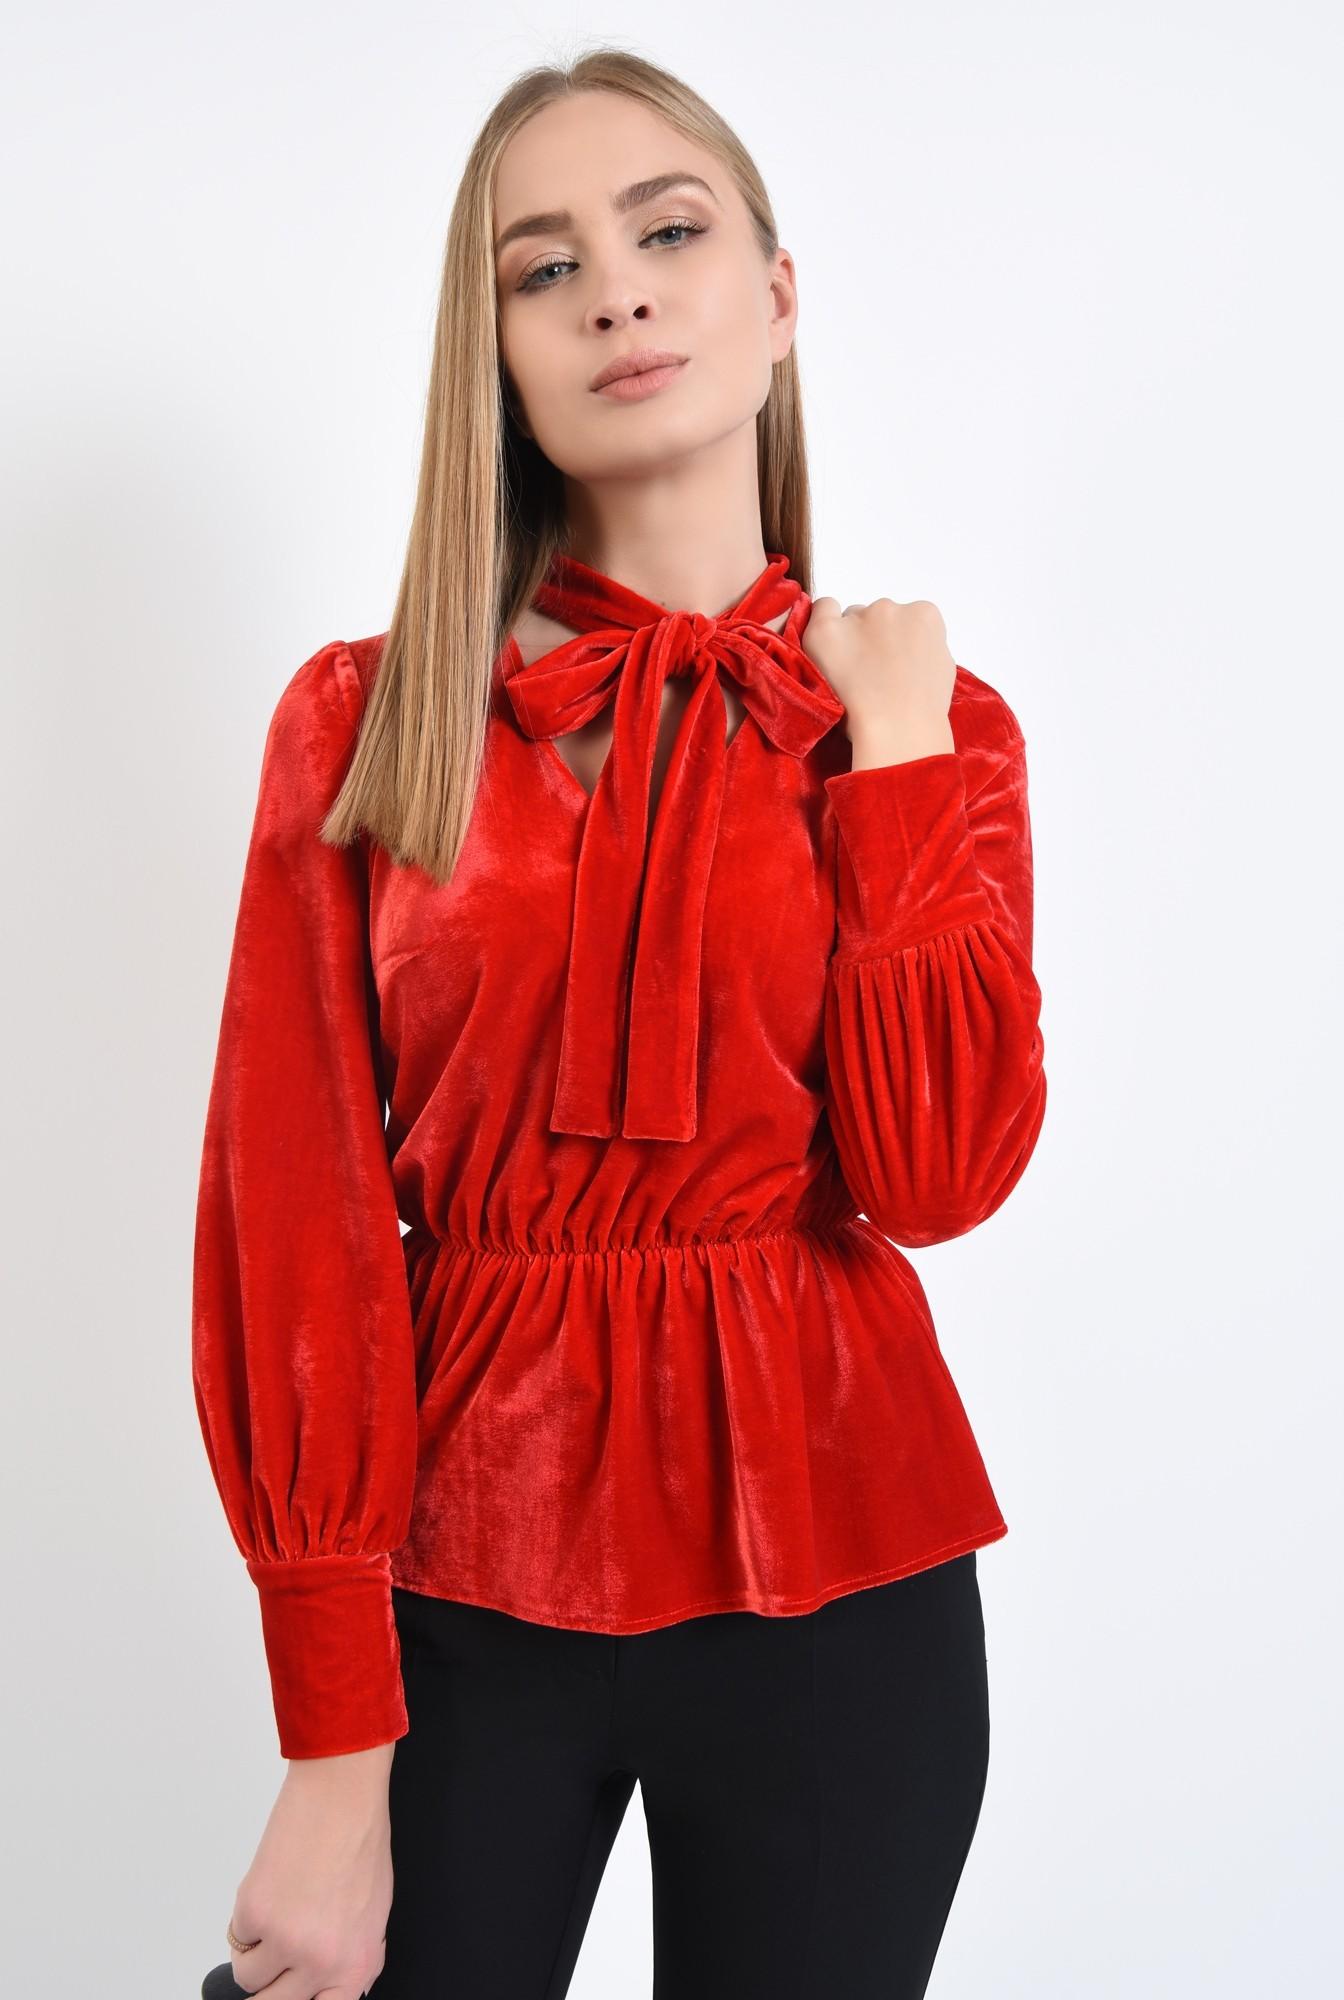 2 - bluza din catifea, rosie, eleganta, bluza dama, online